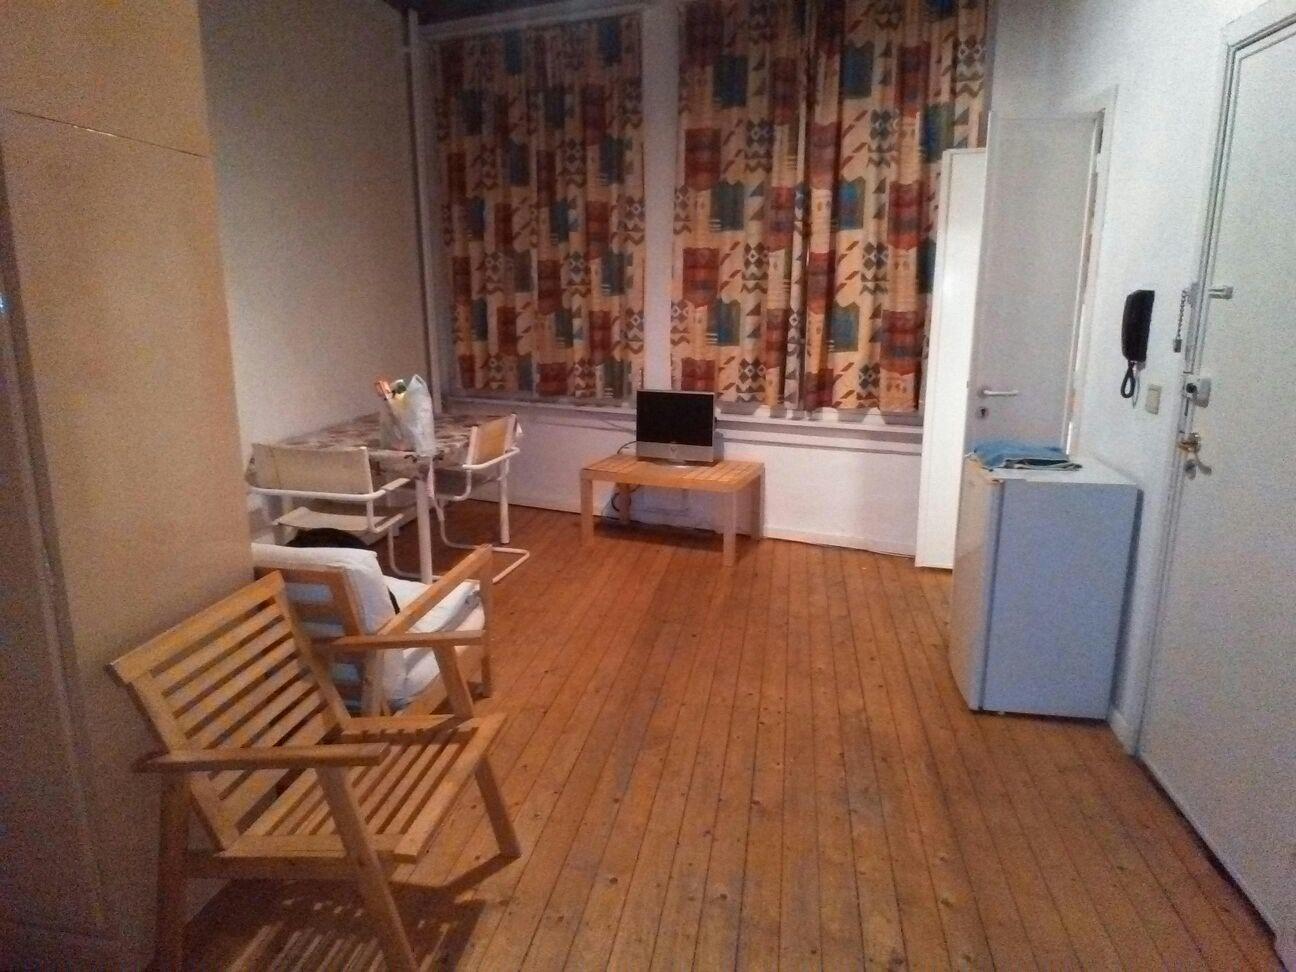 furnished-studio-flat-central-antwerpen-belgium-8ece7027f5dd962da46a333342d9d08d